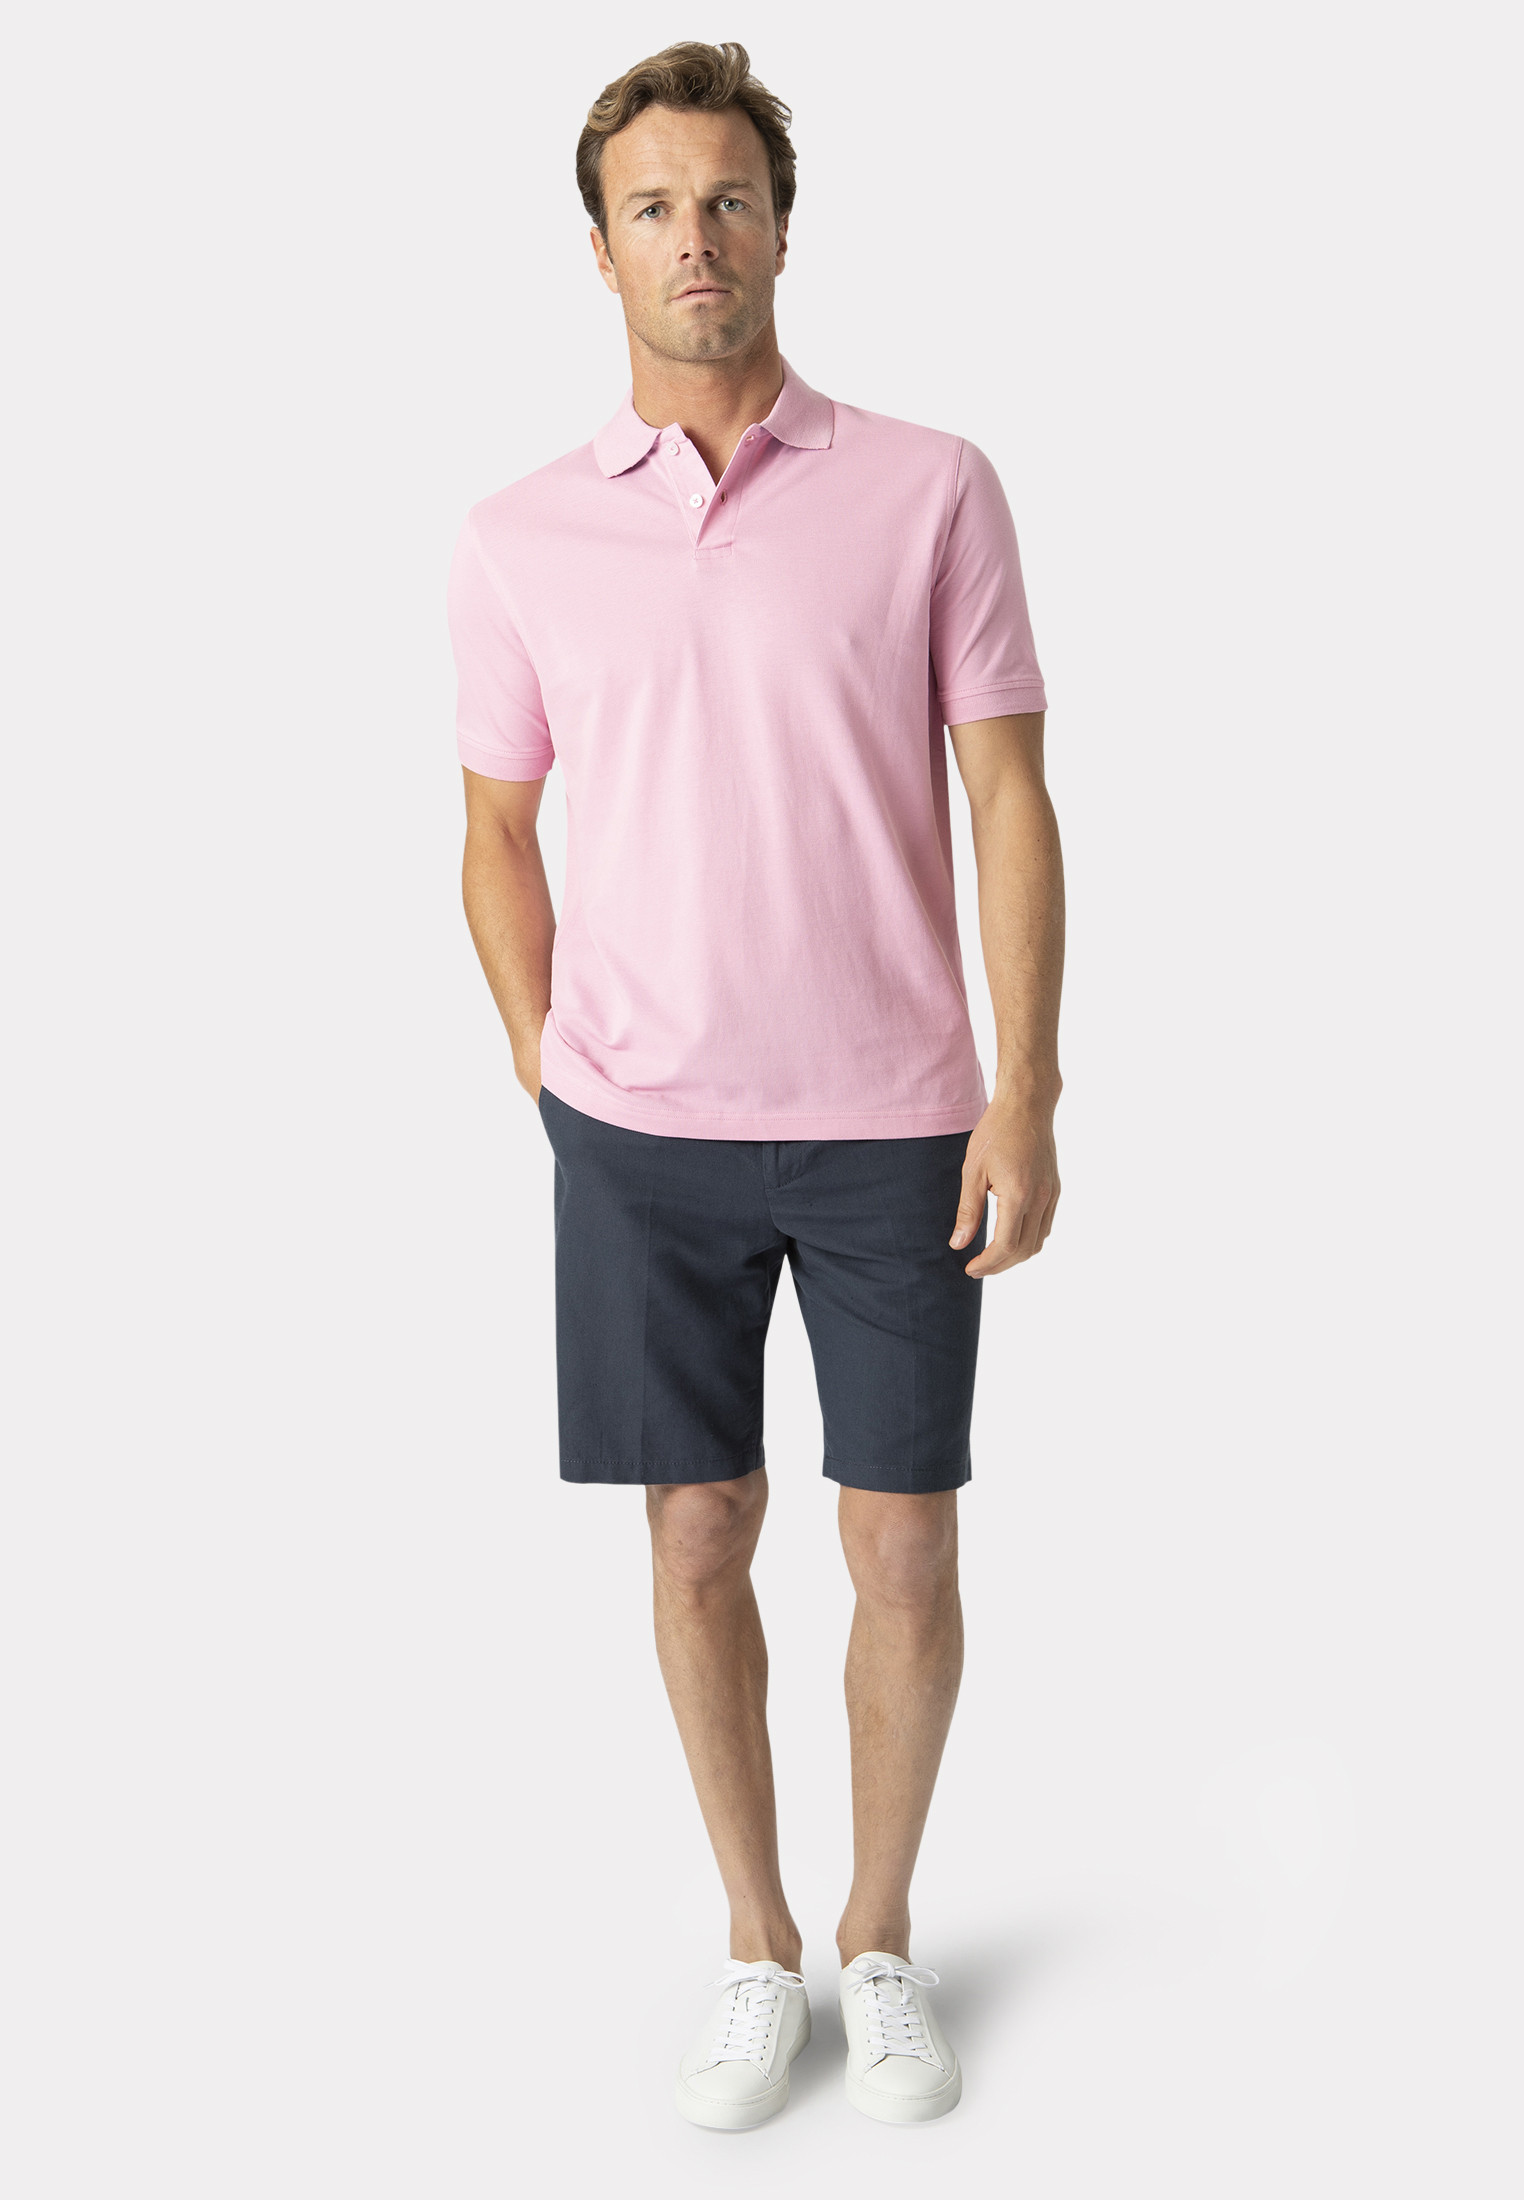 Milford Pink 100% Pique Cotton Polo Shirt